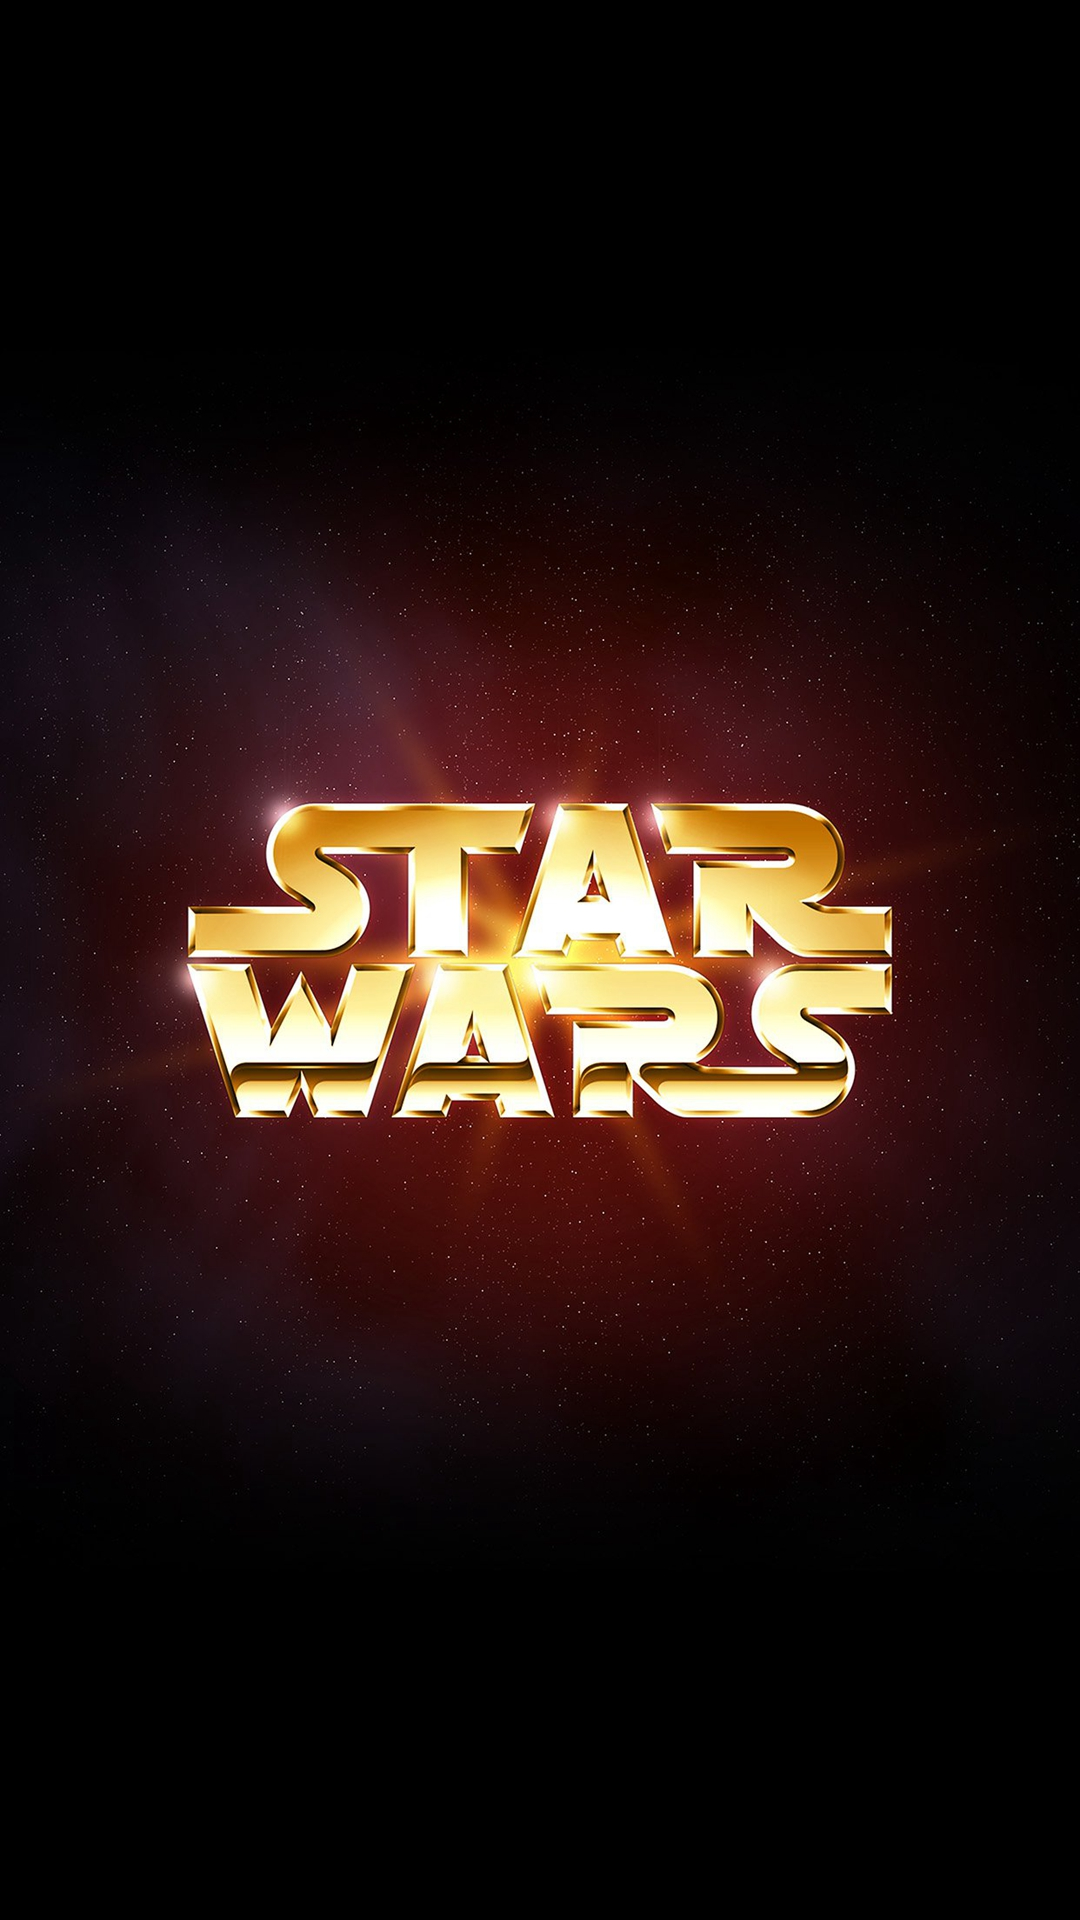 Star Wars Logo Iphone 6 1080x1920 Wallpaper Teahub Io